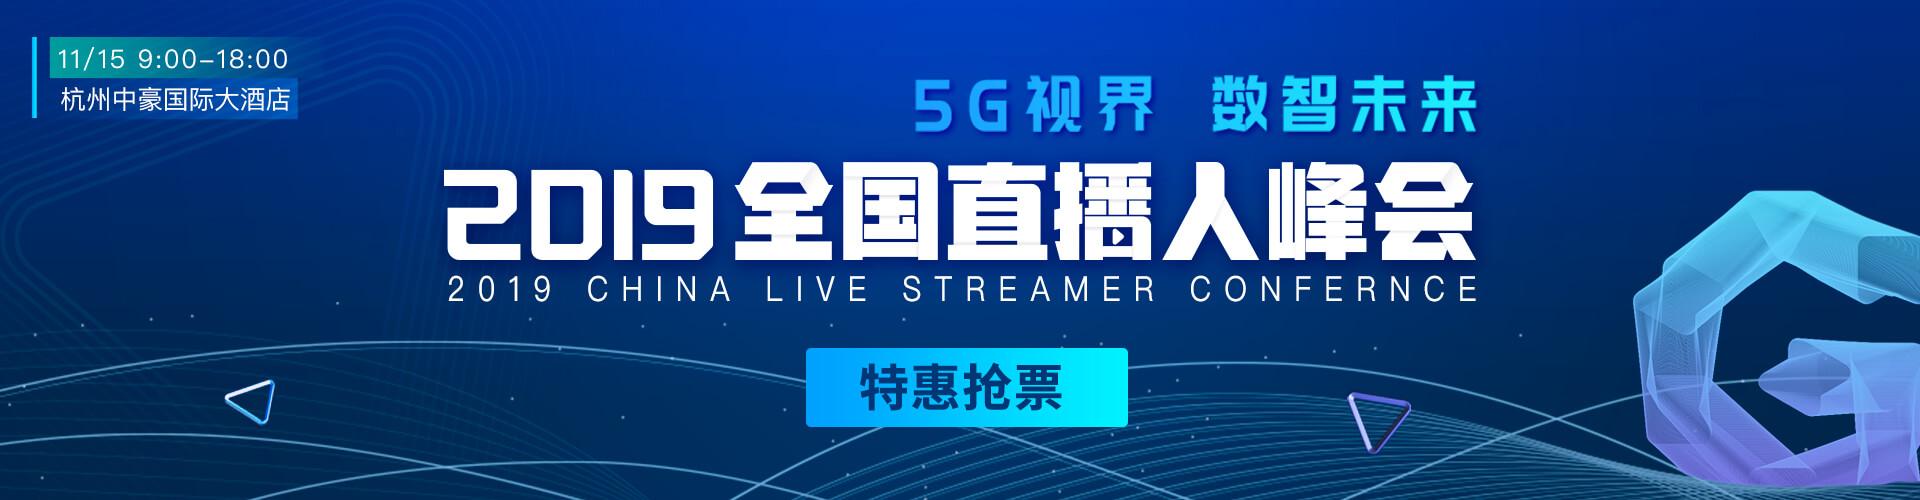 5G视界 数智未来丨2019全国直播人峰会